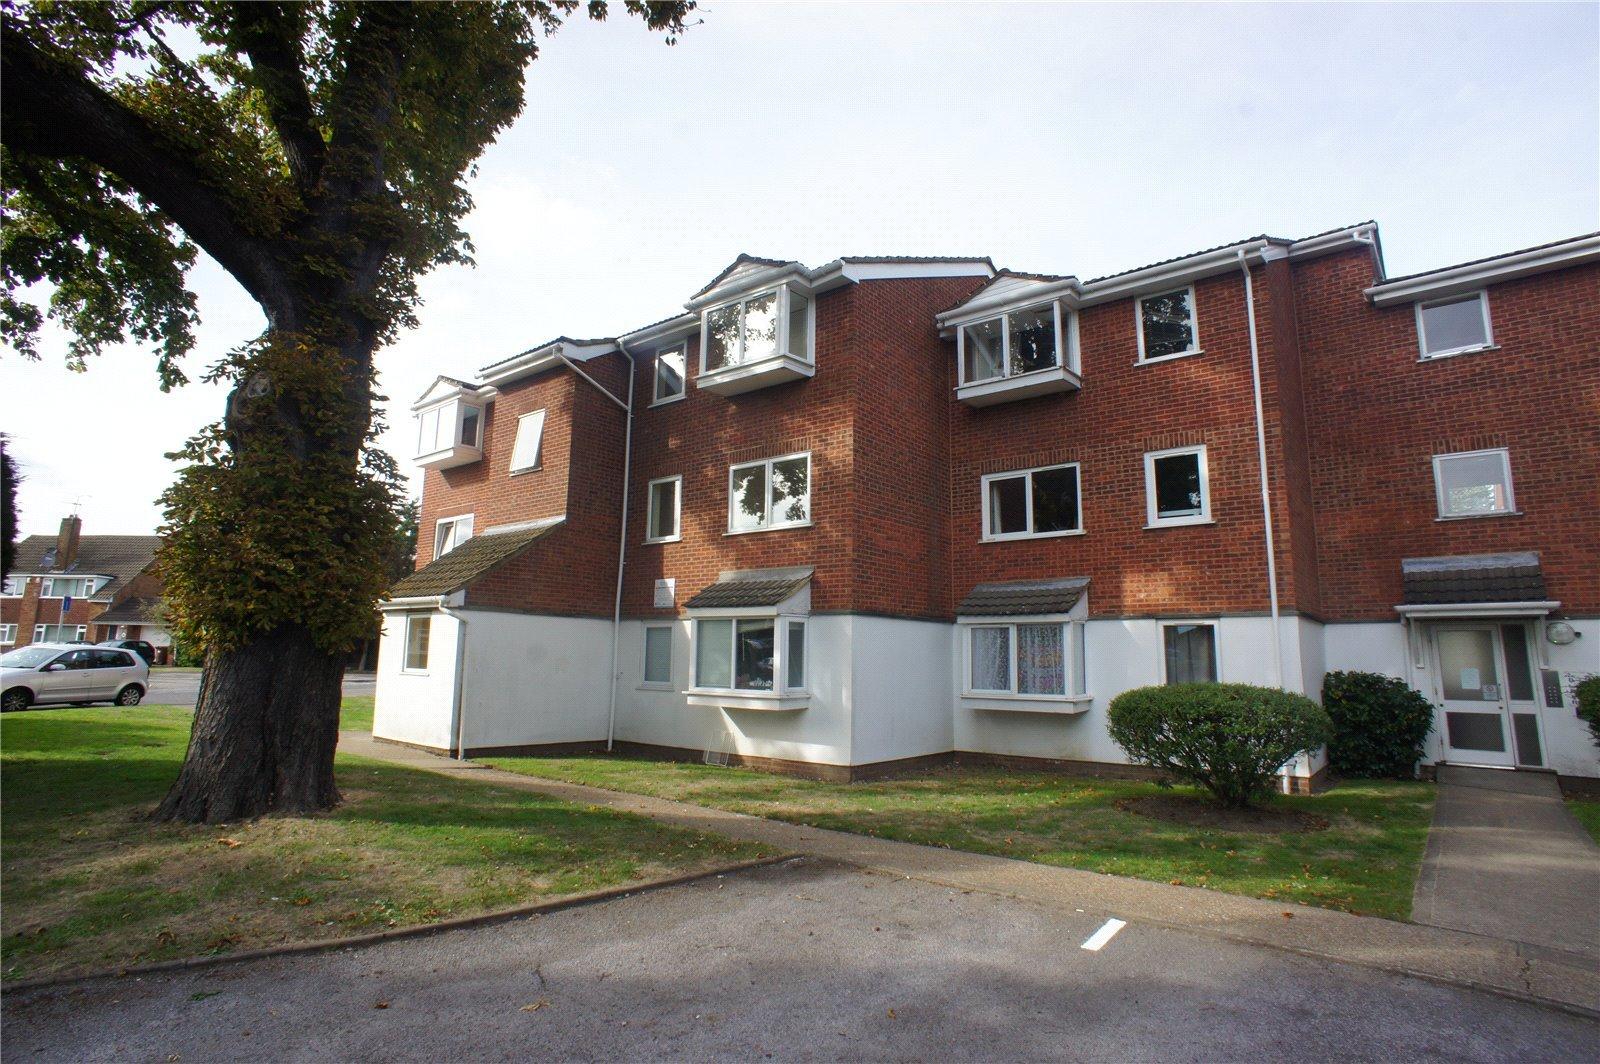 Heathdene Drive, Upper Belvedere, Kent, DA17